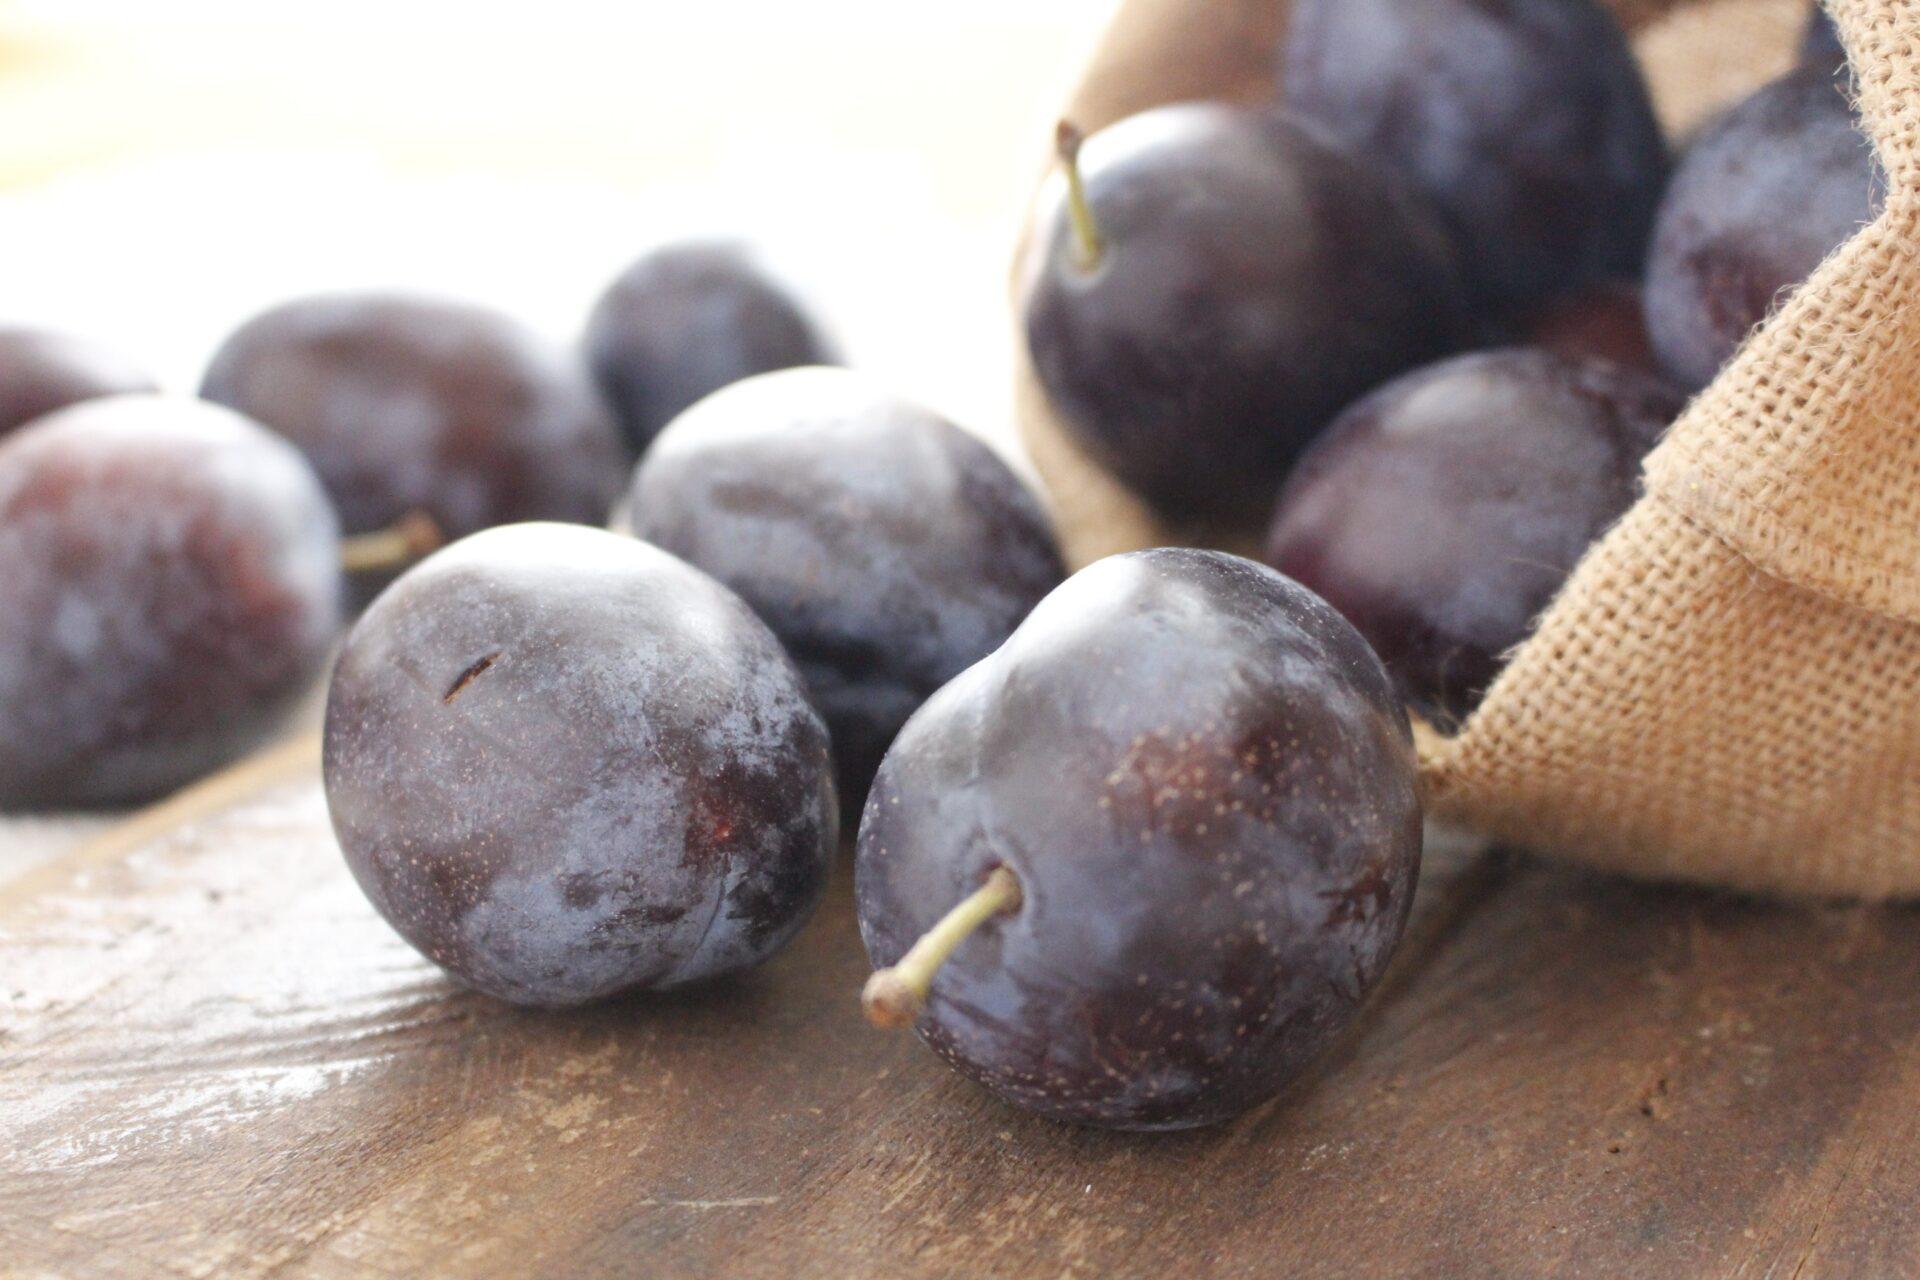 Confettura di susine italian plum jam passion and cooking - Plum jam without sugar homemade taste and health ...